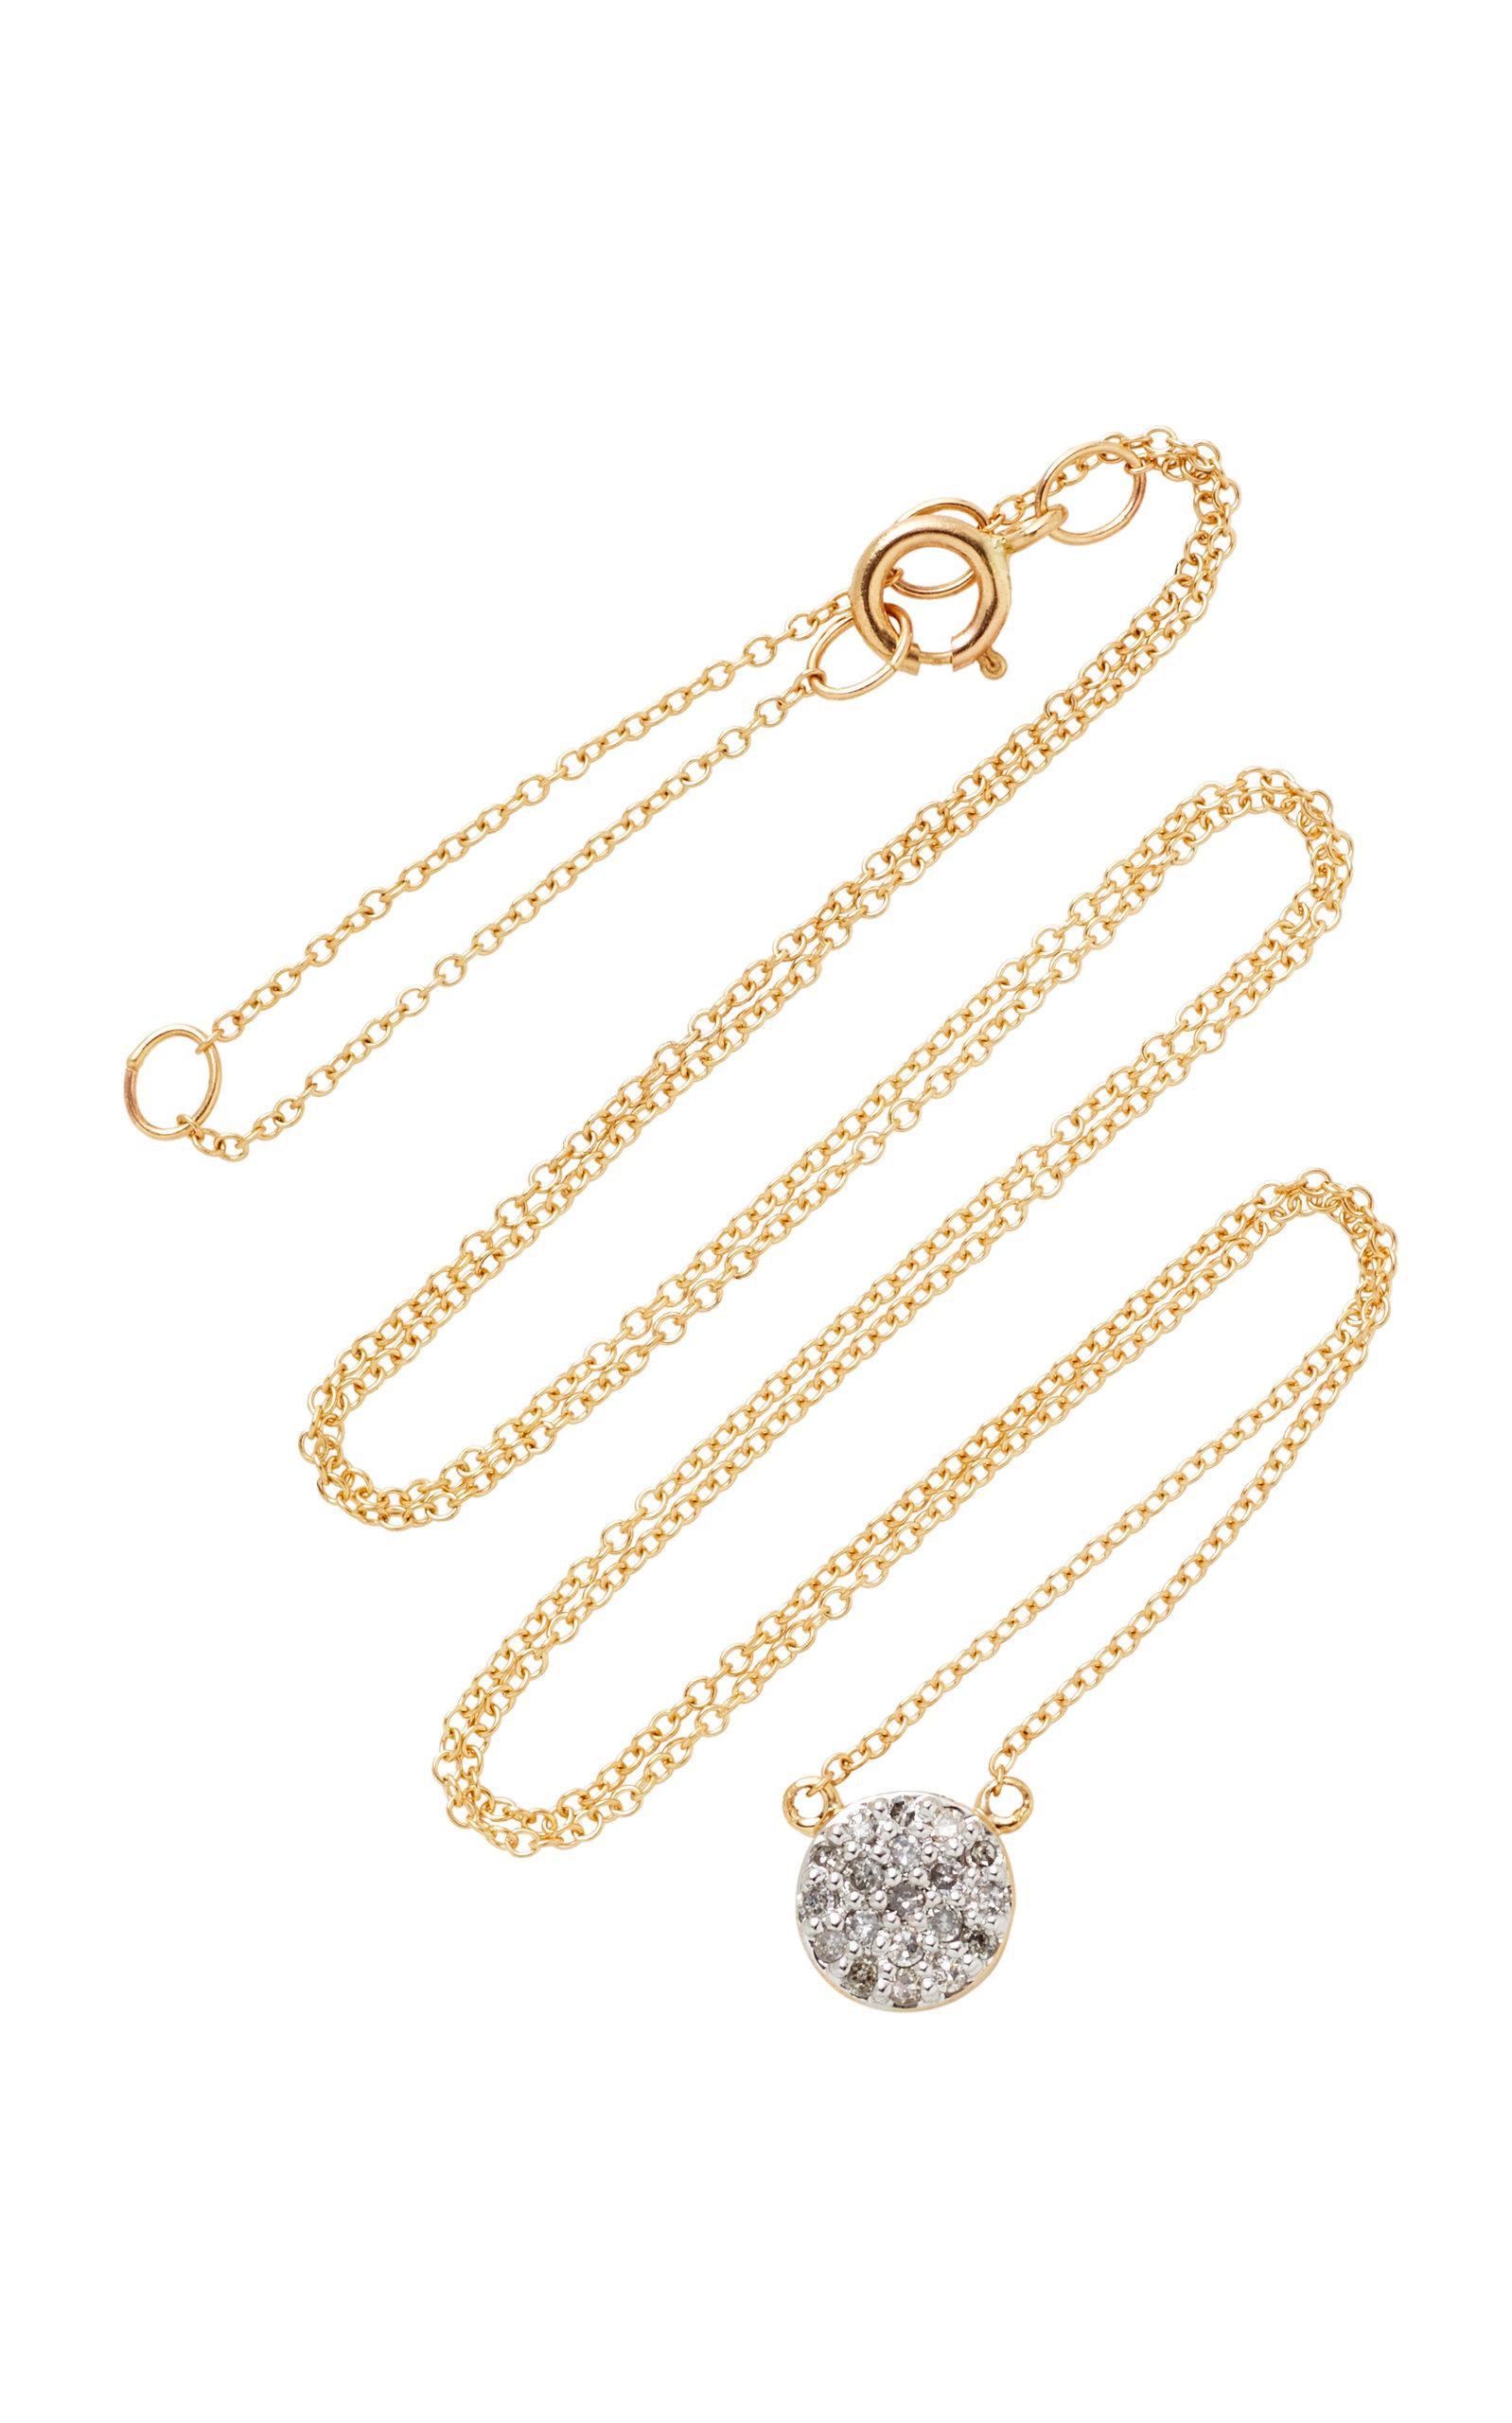 Mateo 14K GOLD DIAMOND NECKLACE